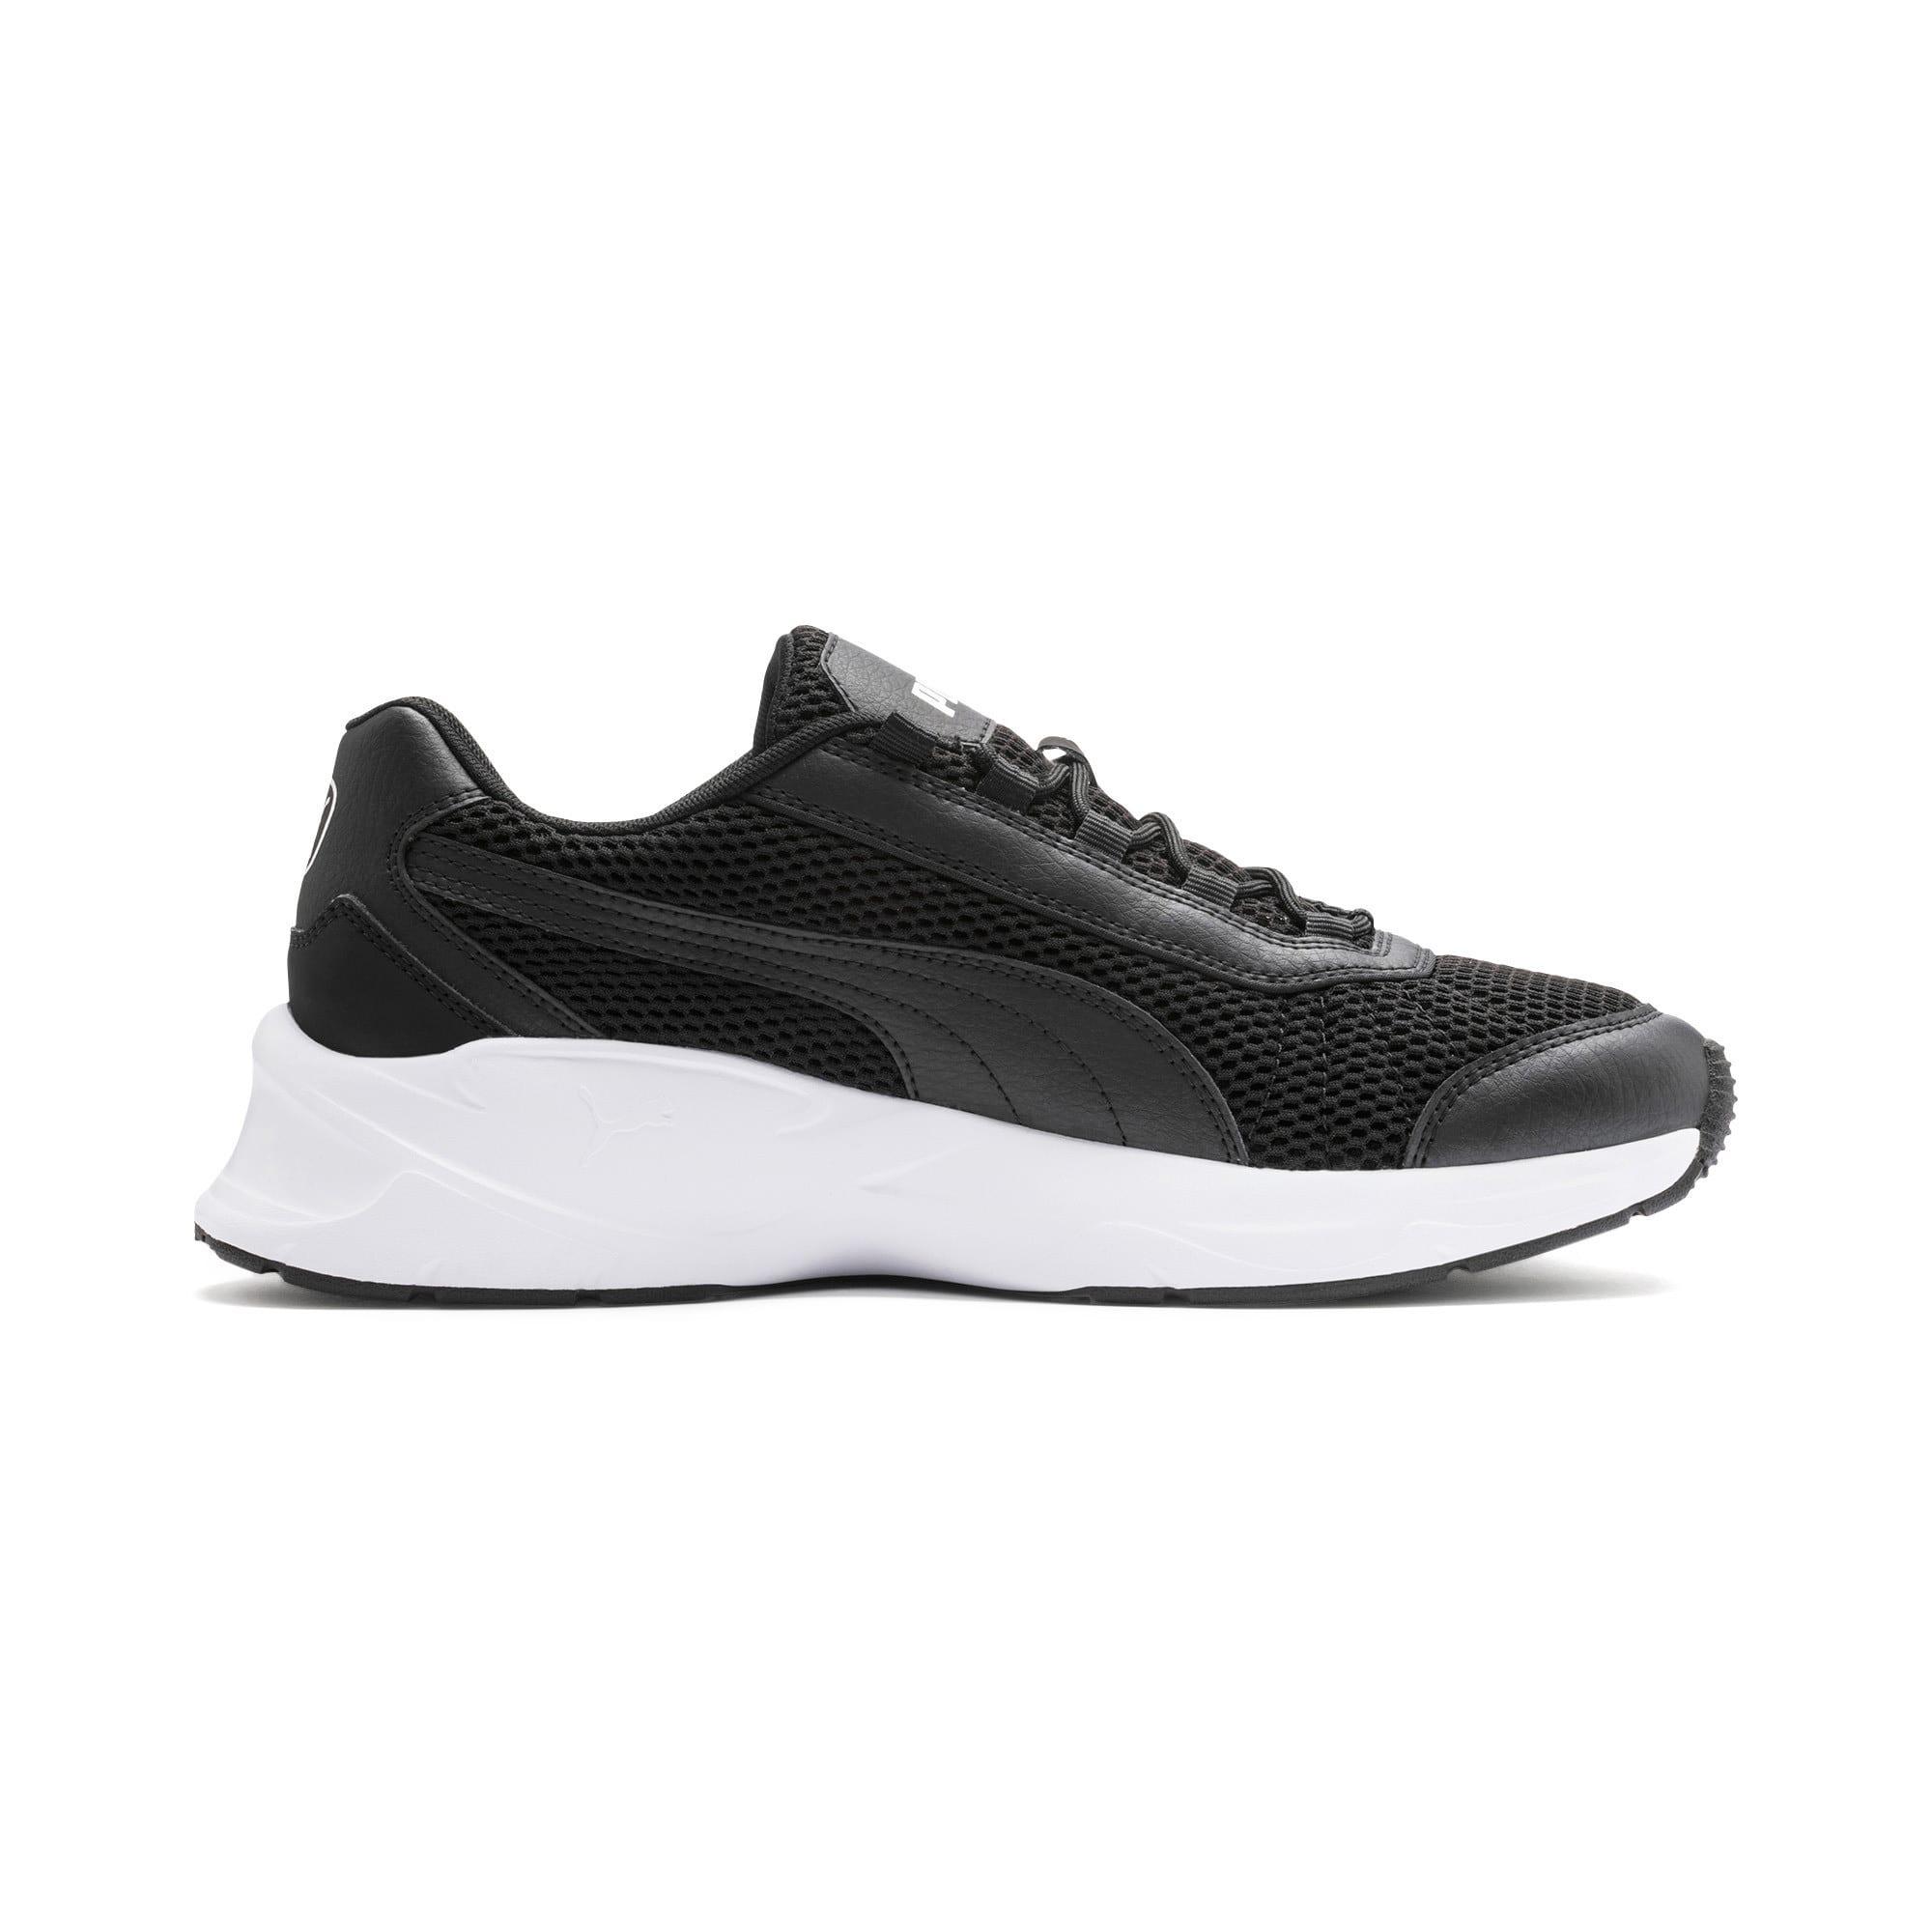 Thumbnail 6 of Nucleus Training Shoes, Puma Black-Puma Black, medium